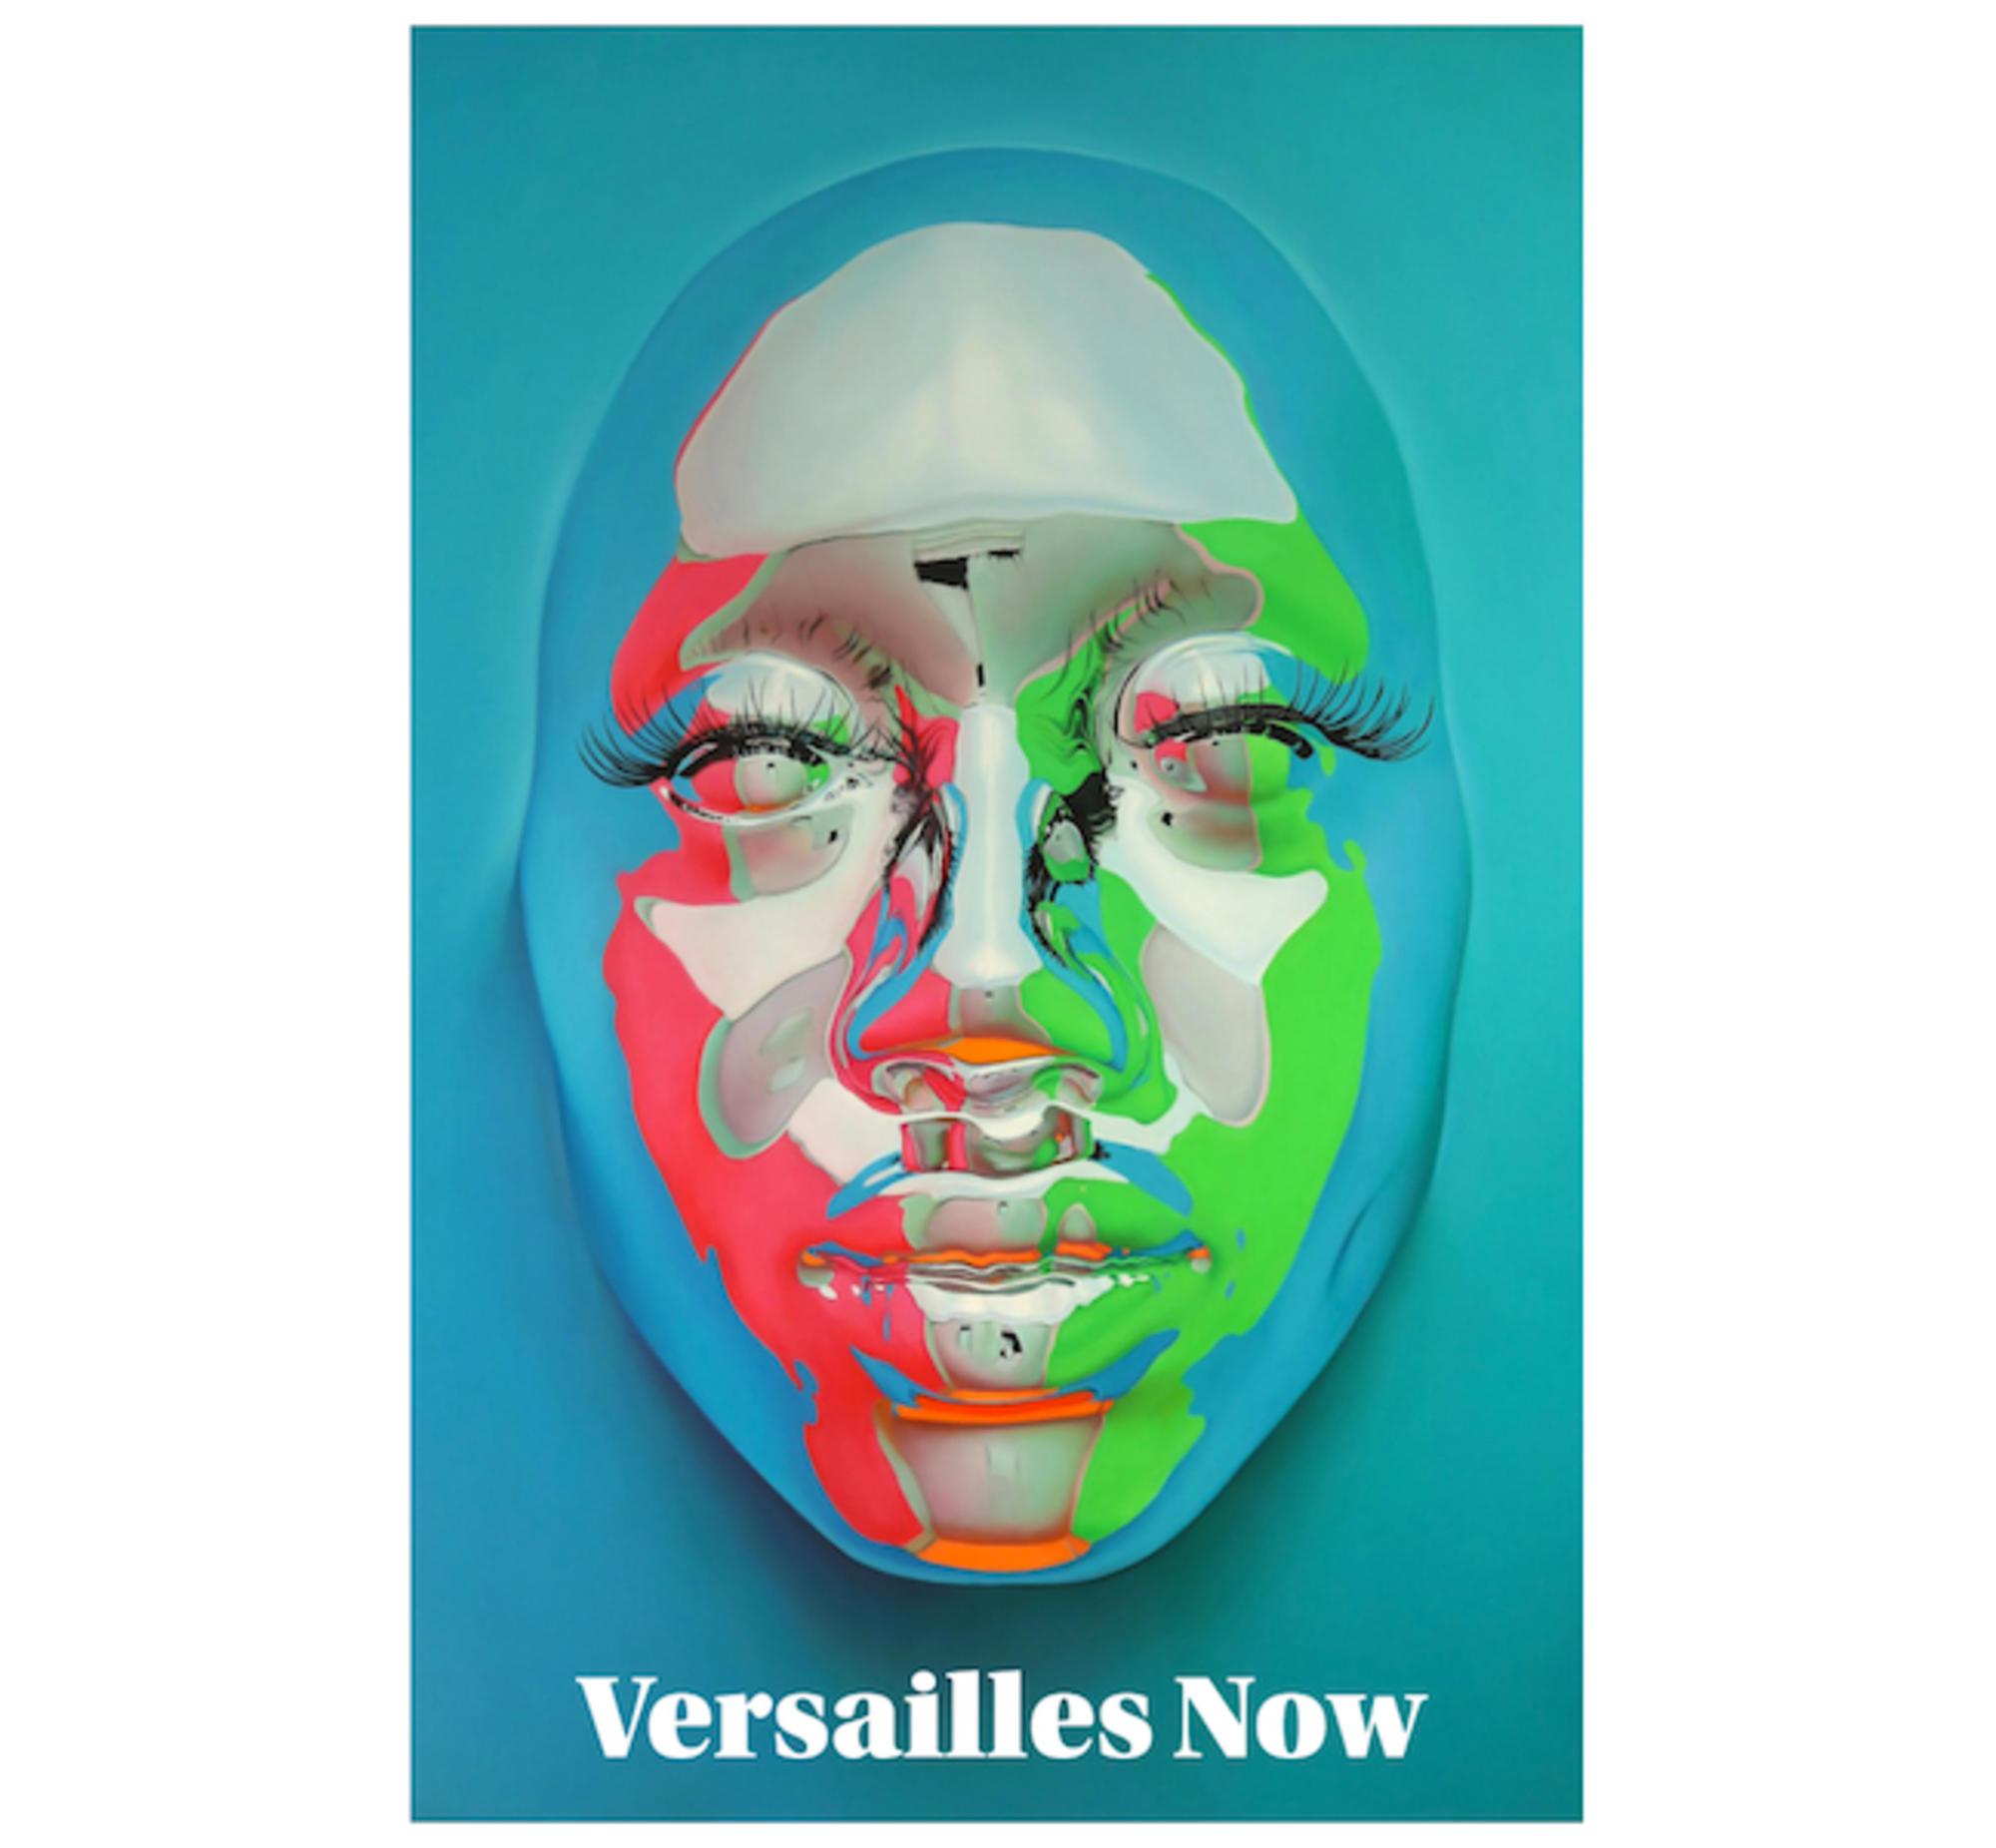 Joseph Gross Gallery presents: VERSAILLES NOW